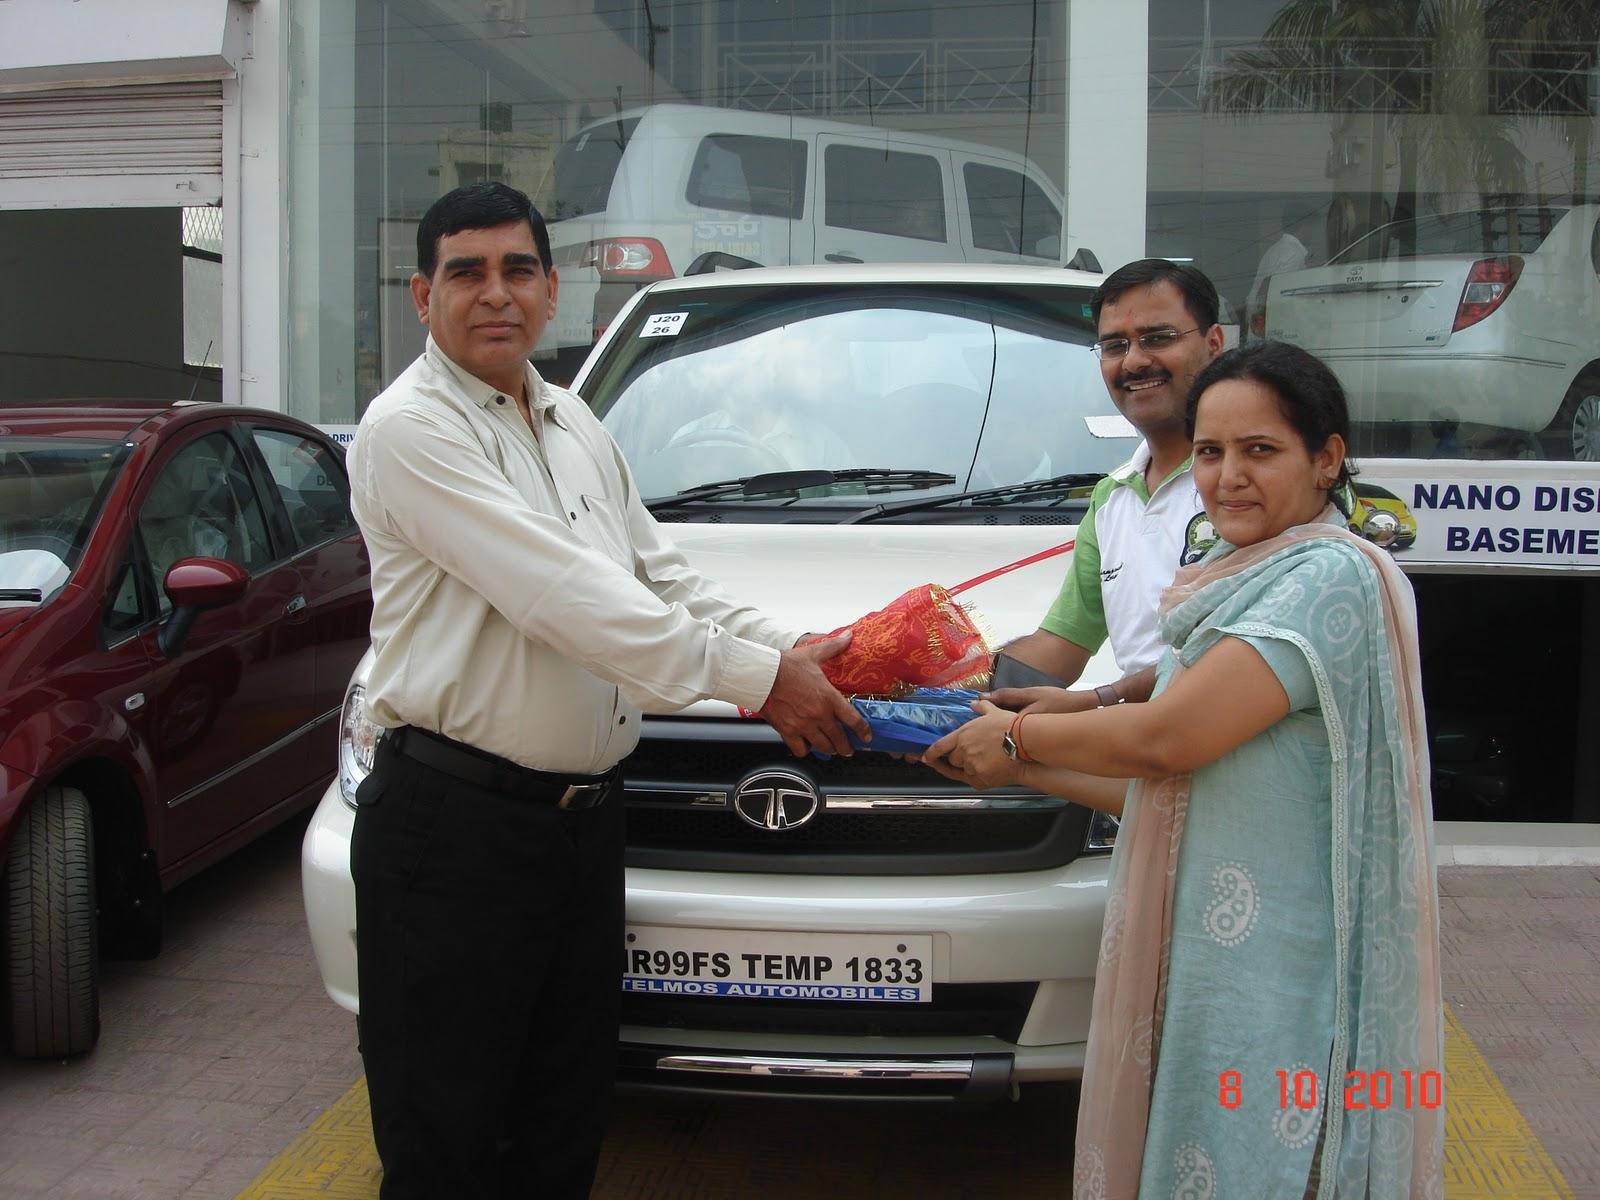 Used Tata New Safari in Bangalore - 27 Verified New Safari